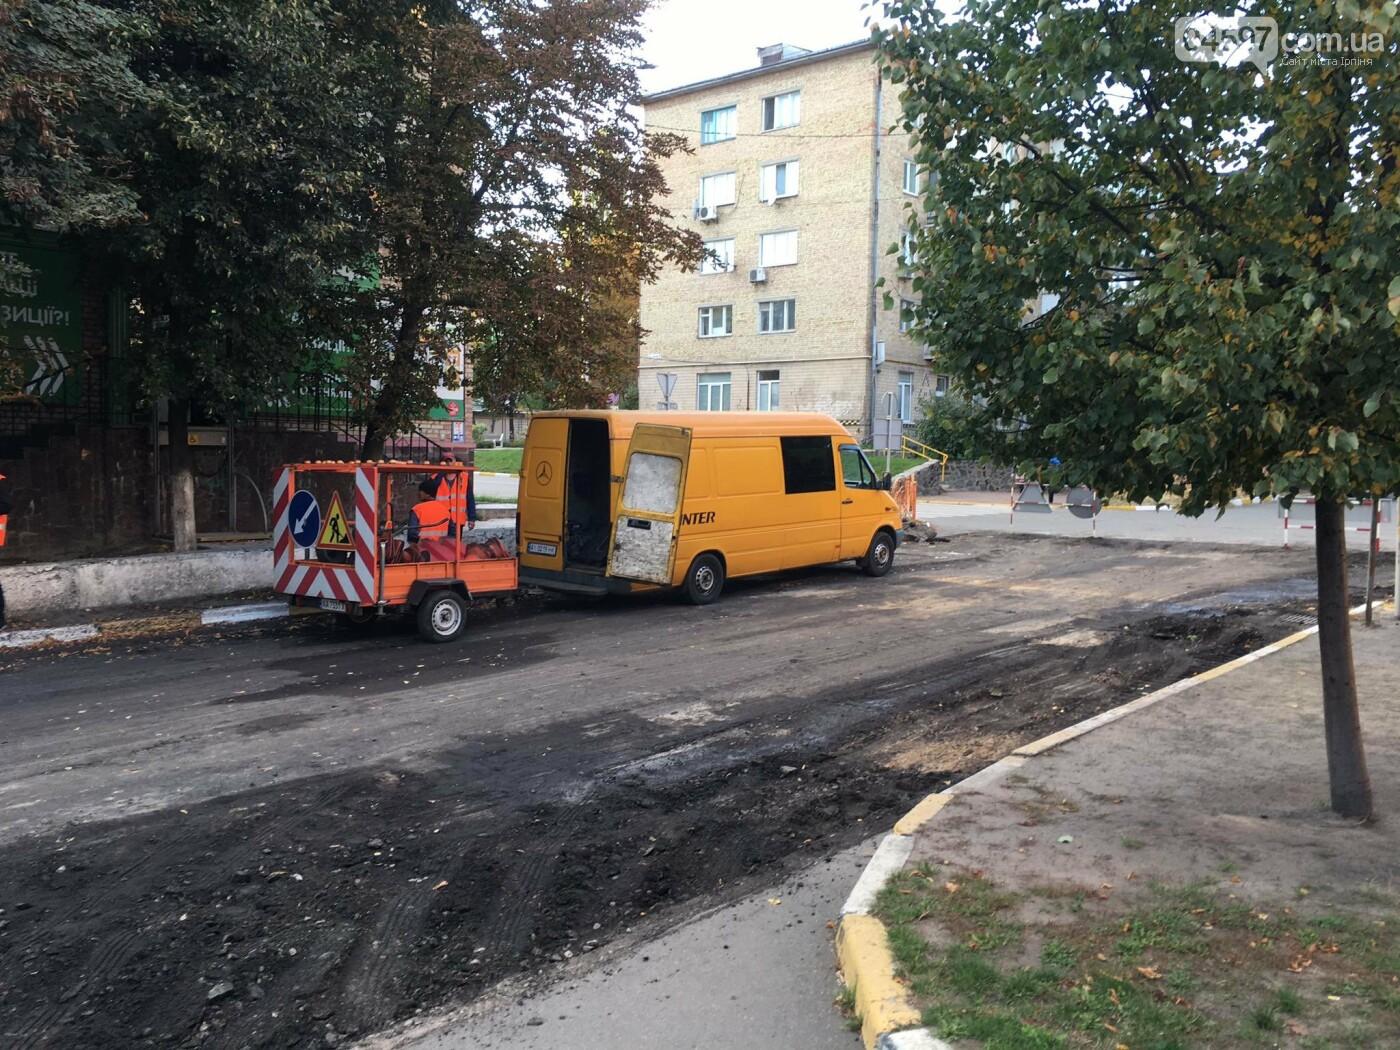 В Бучі вулицю Польову перекрили на ремонт, фото-1